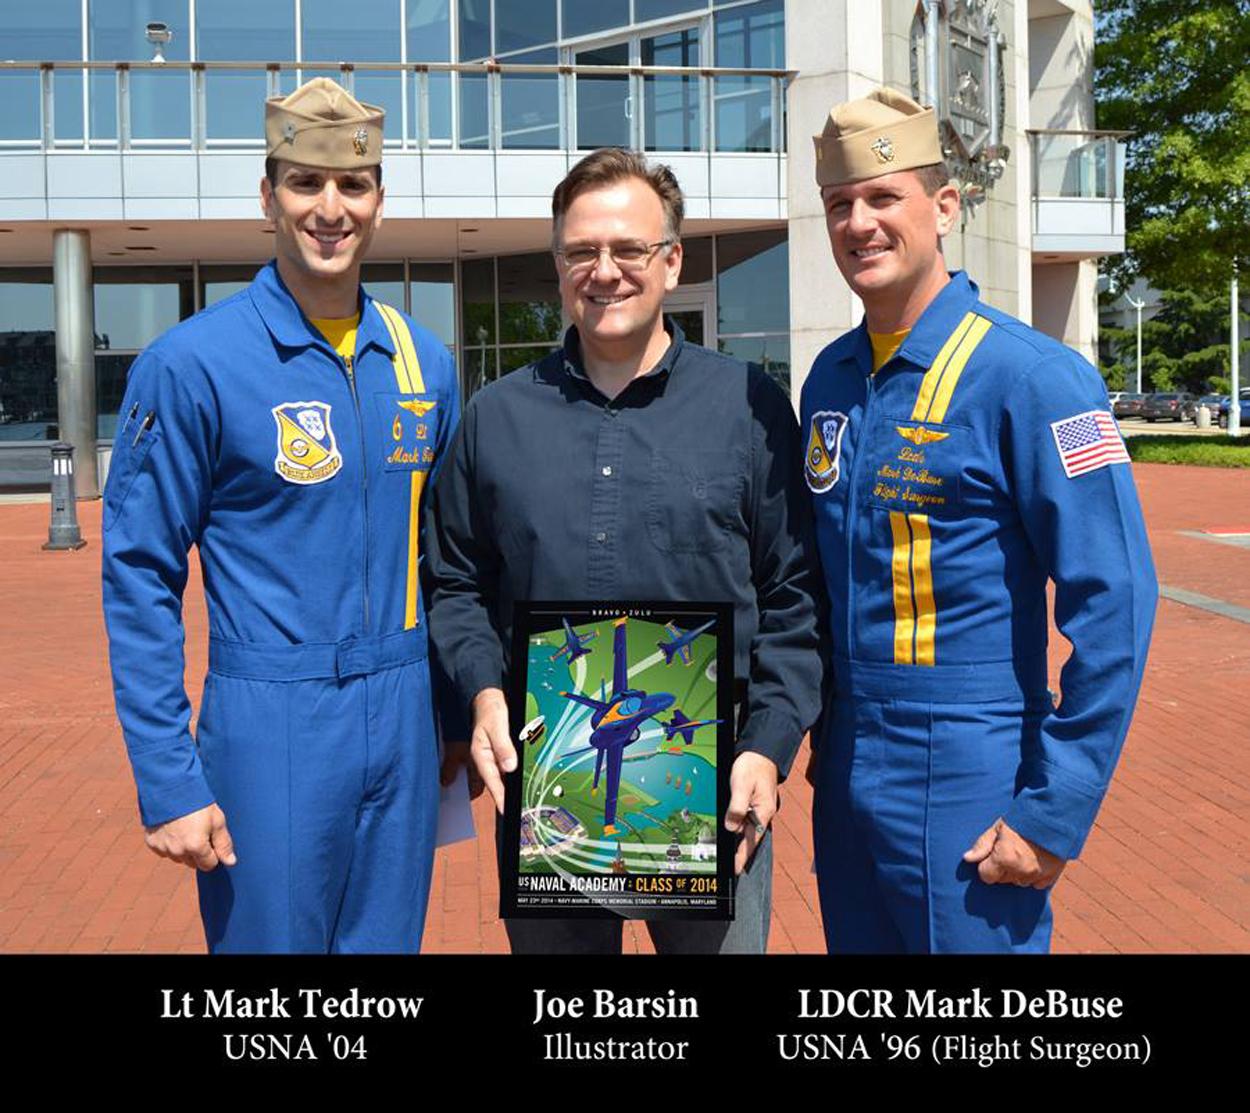 Lt Mark Tedrow, Blue Angel Pilot of #6 (USNA '04), Joe Barsin of CitizenPride.com and LDCR Mark DeBuse, Blue Angels Flight Surgeon (USNA '96) at U.S. Naval Academy, Annapolis, MD on May 19, 2014.